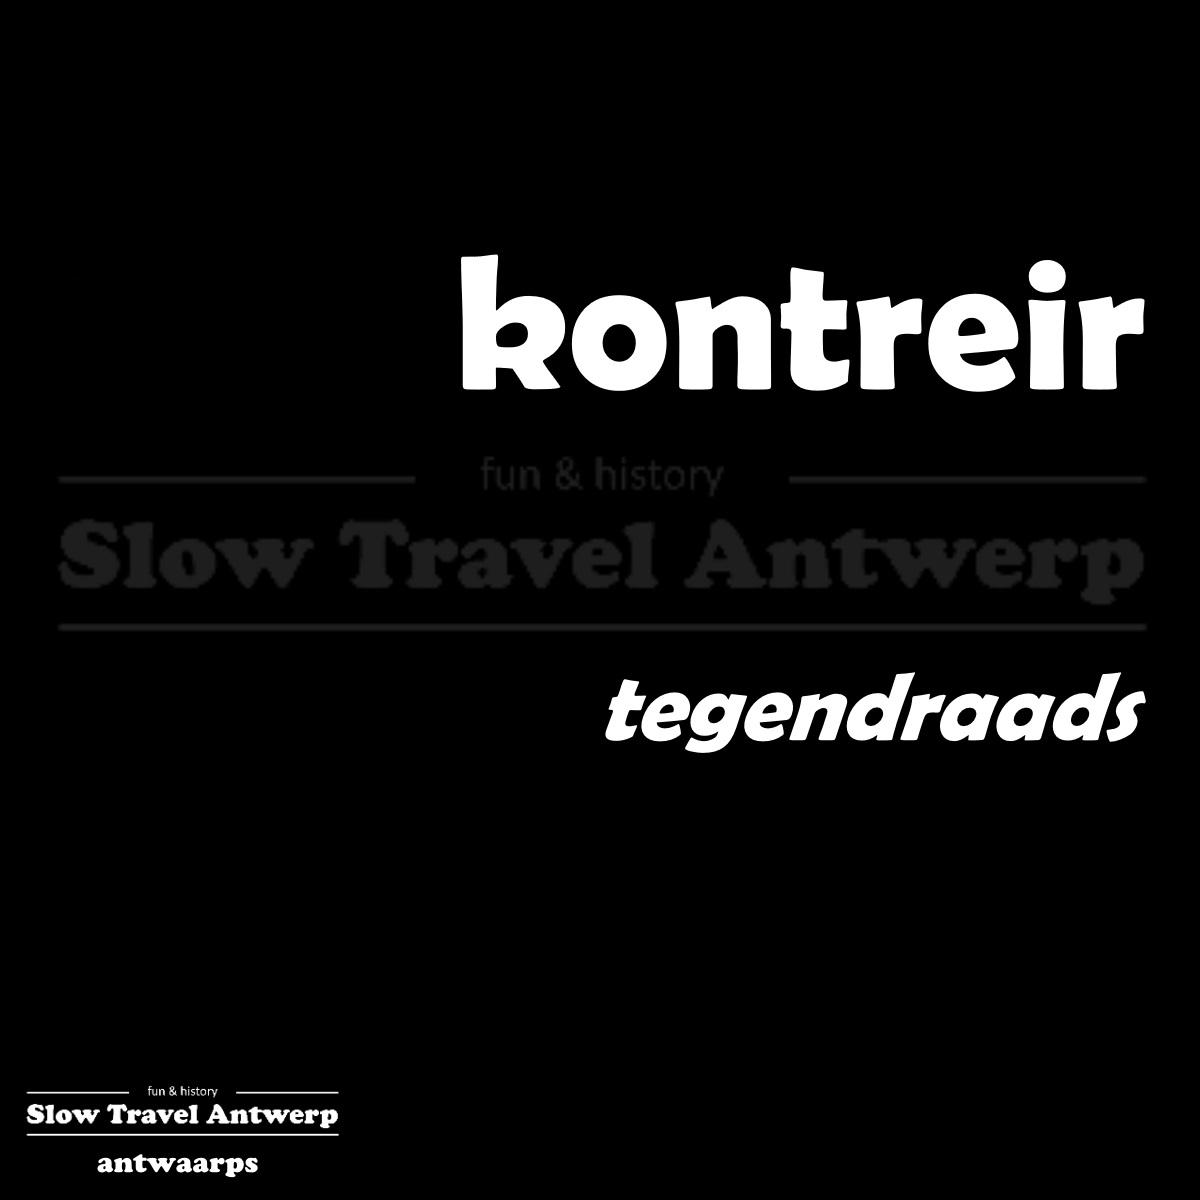 kontreir – tegendraads – contrary